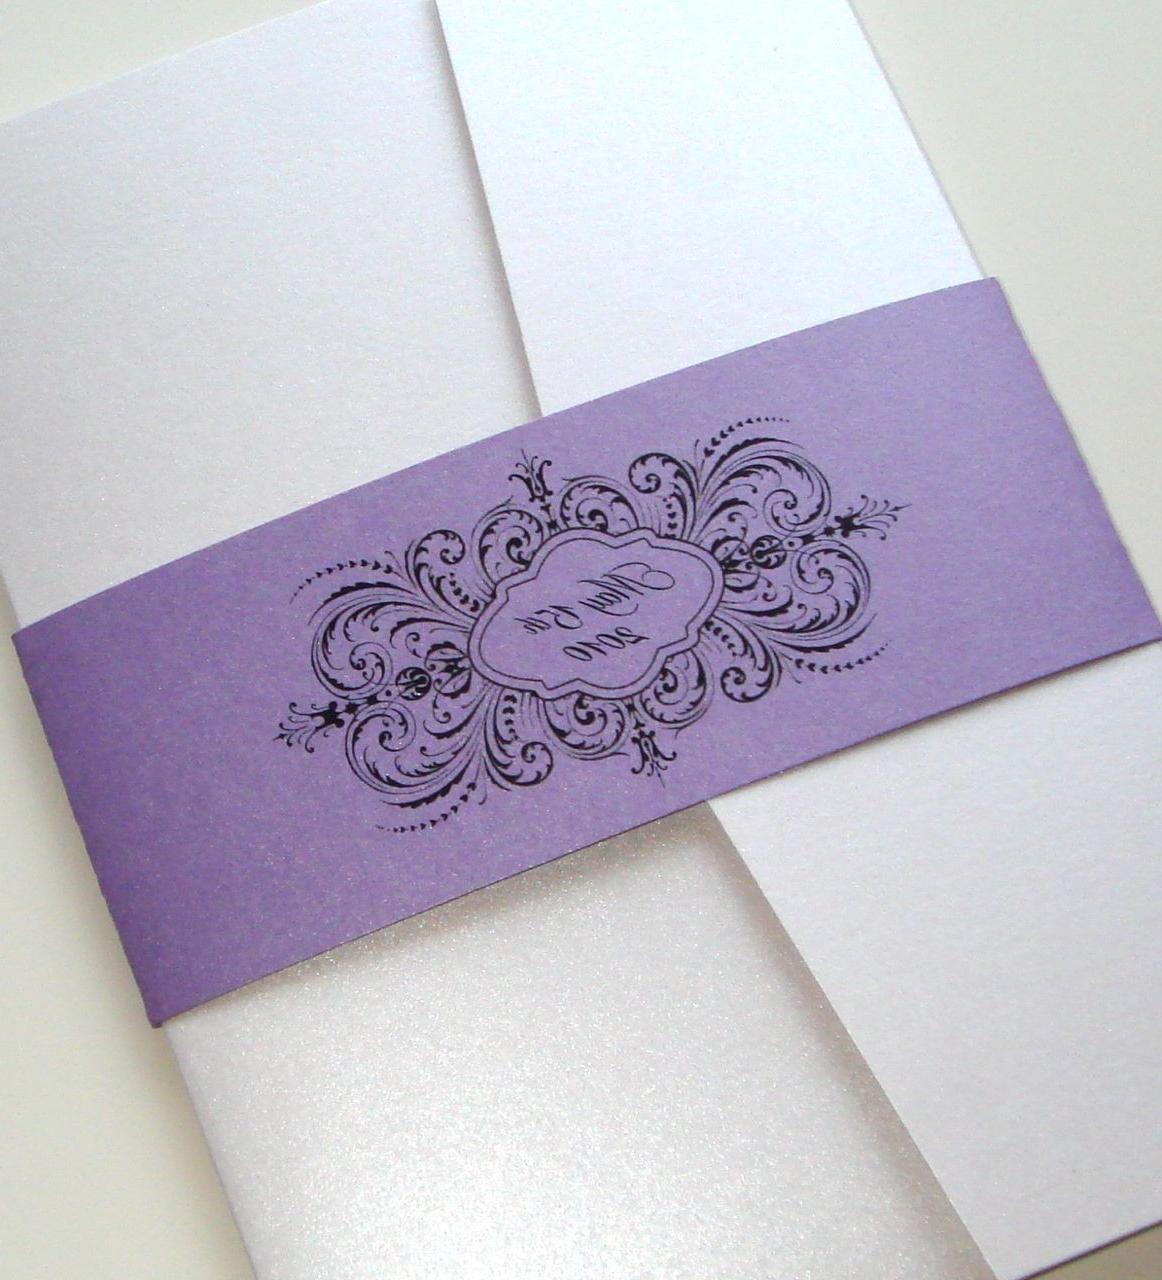 Thalia Pocketfold Wedding Invitation Sample. From embellishedbytiffany